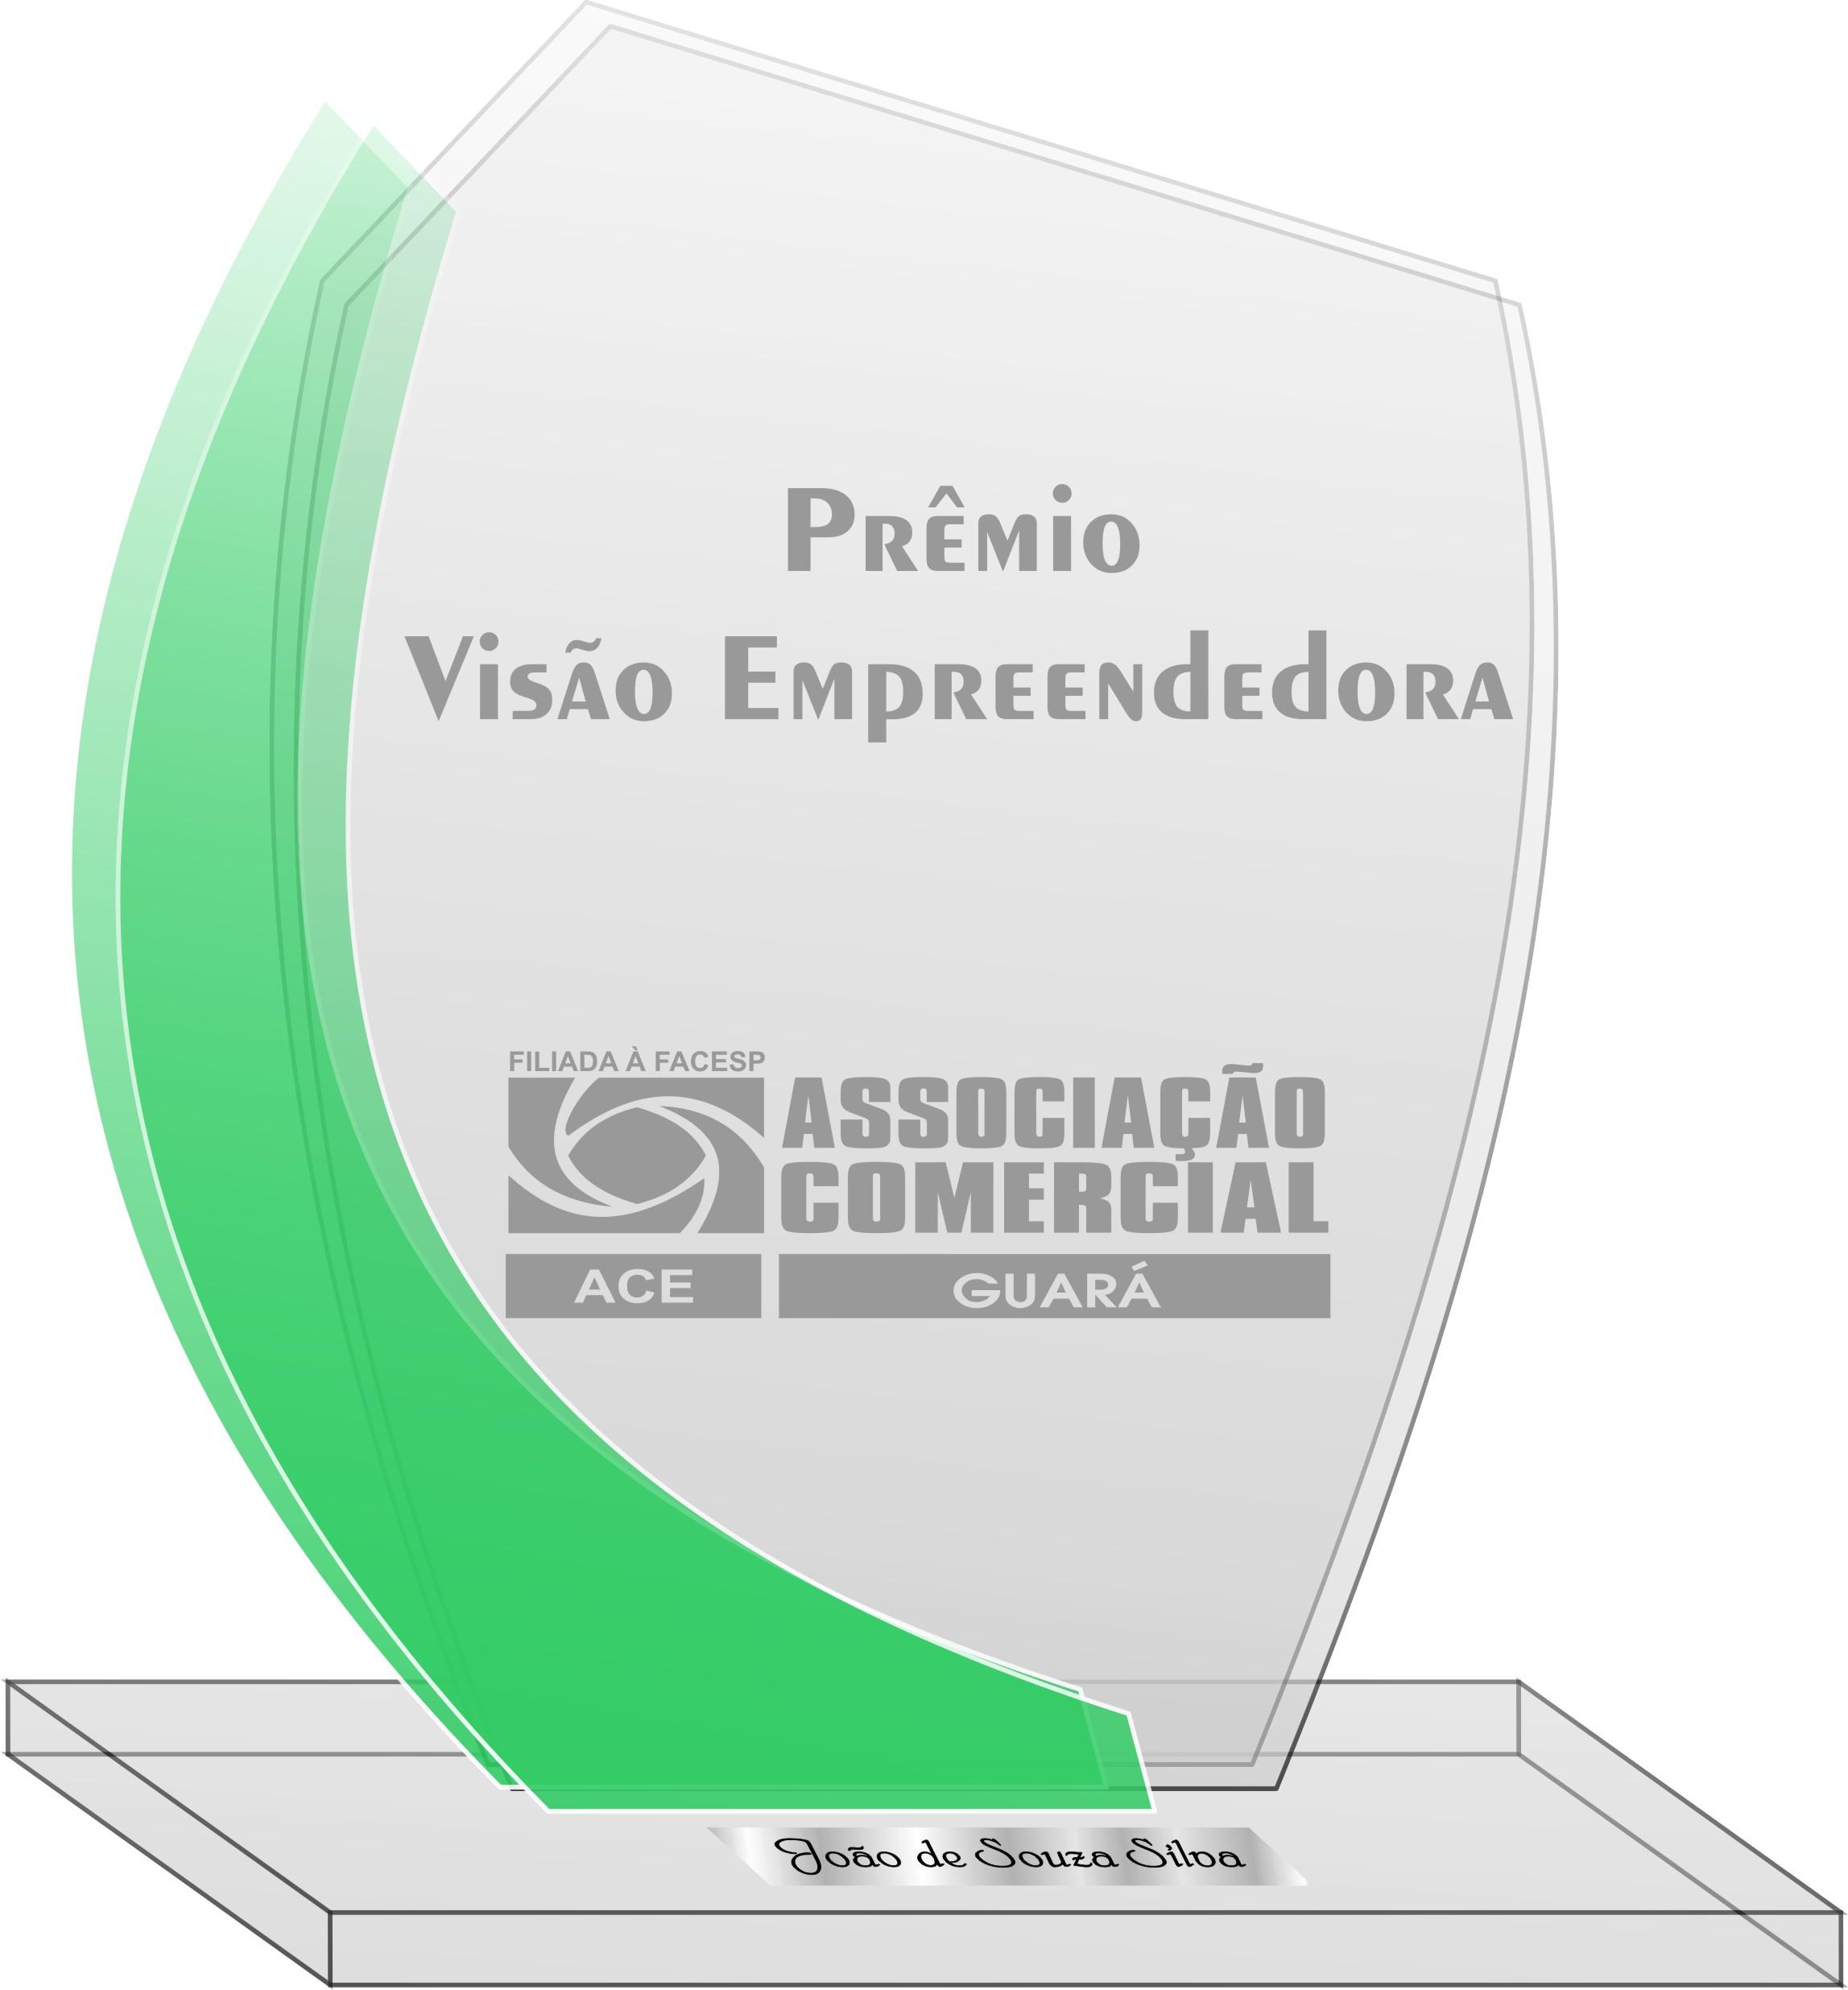 PRÊMIO VISÃO EMPREENDEDORA 2010 ACONTECE NA PRÓXIMA SEXTA!